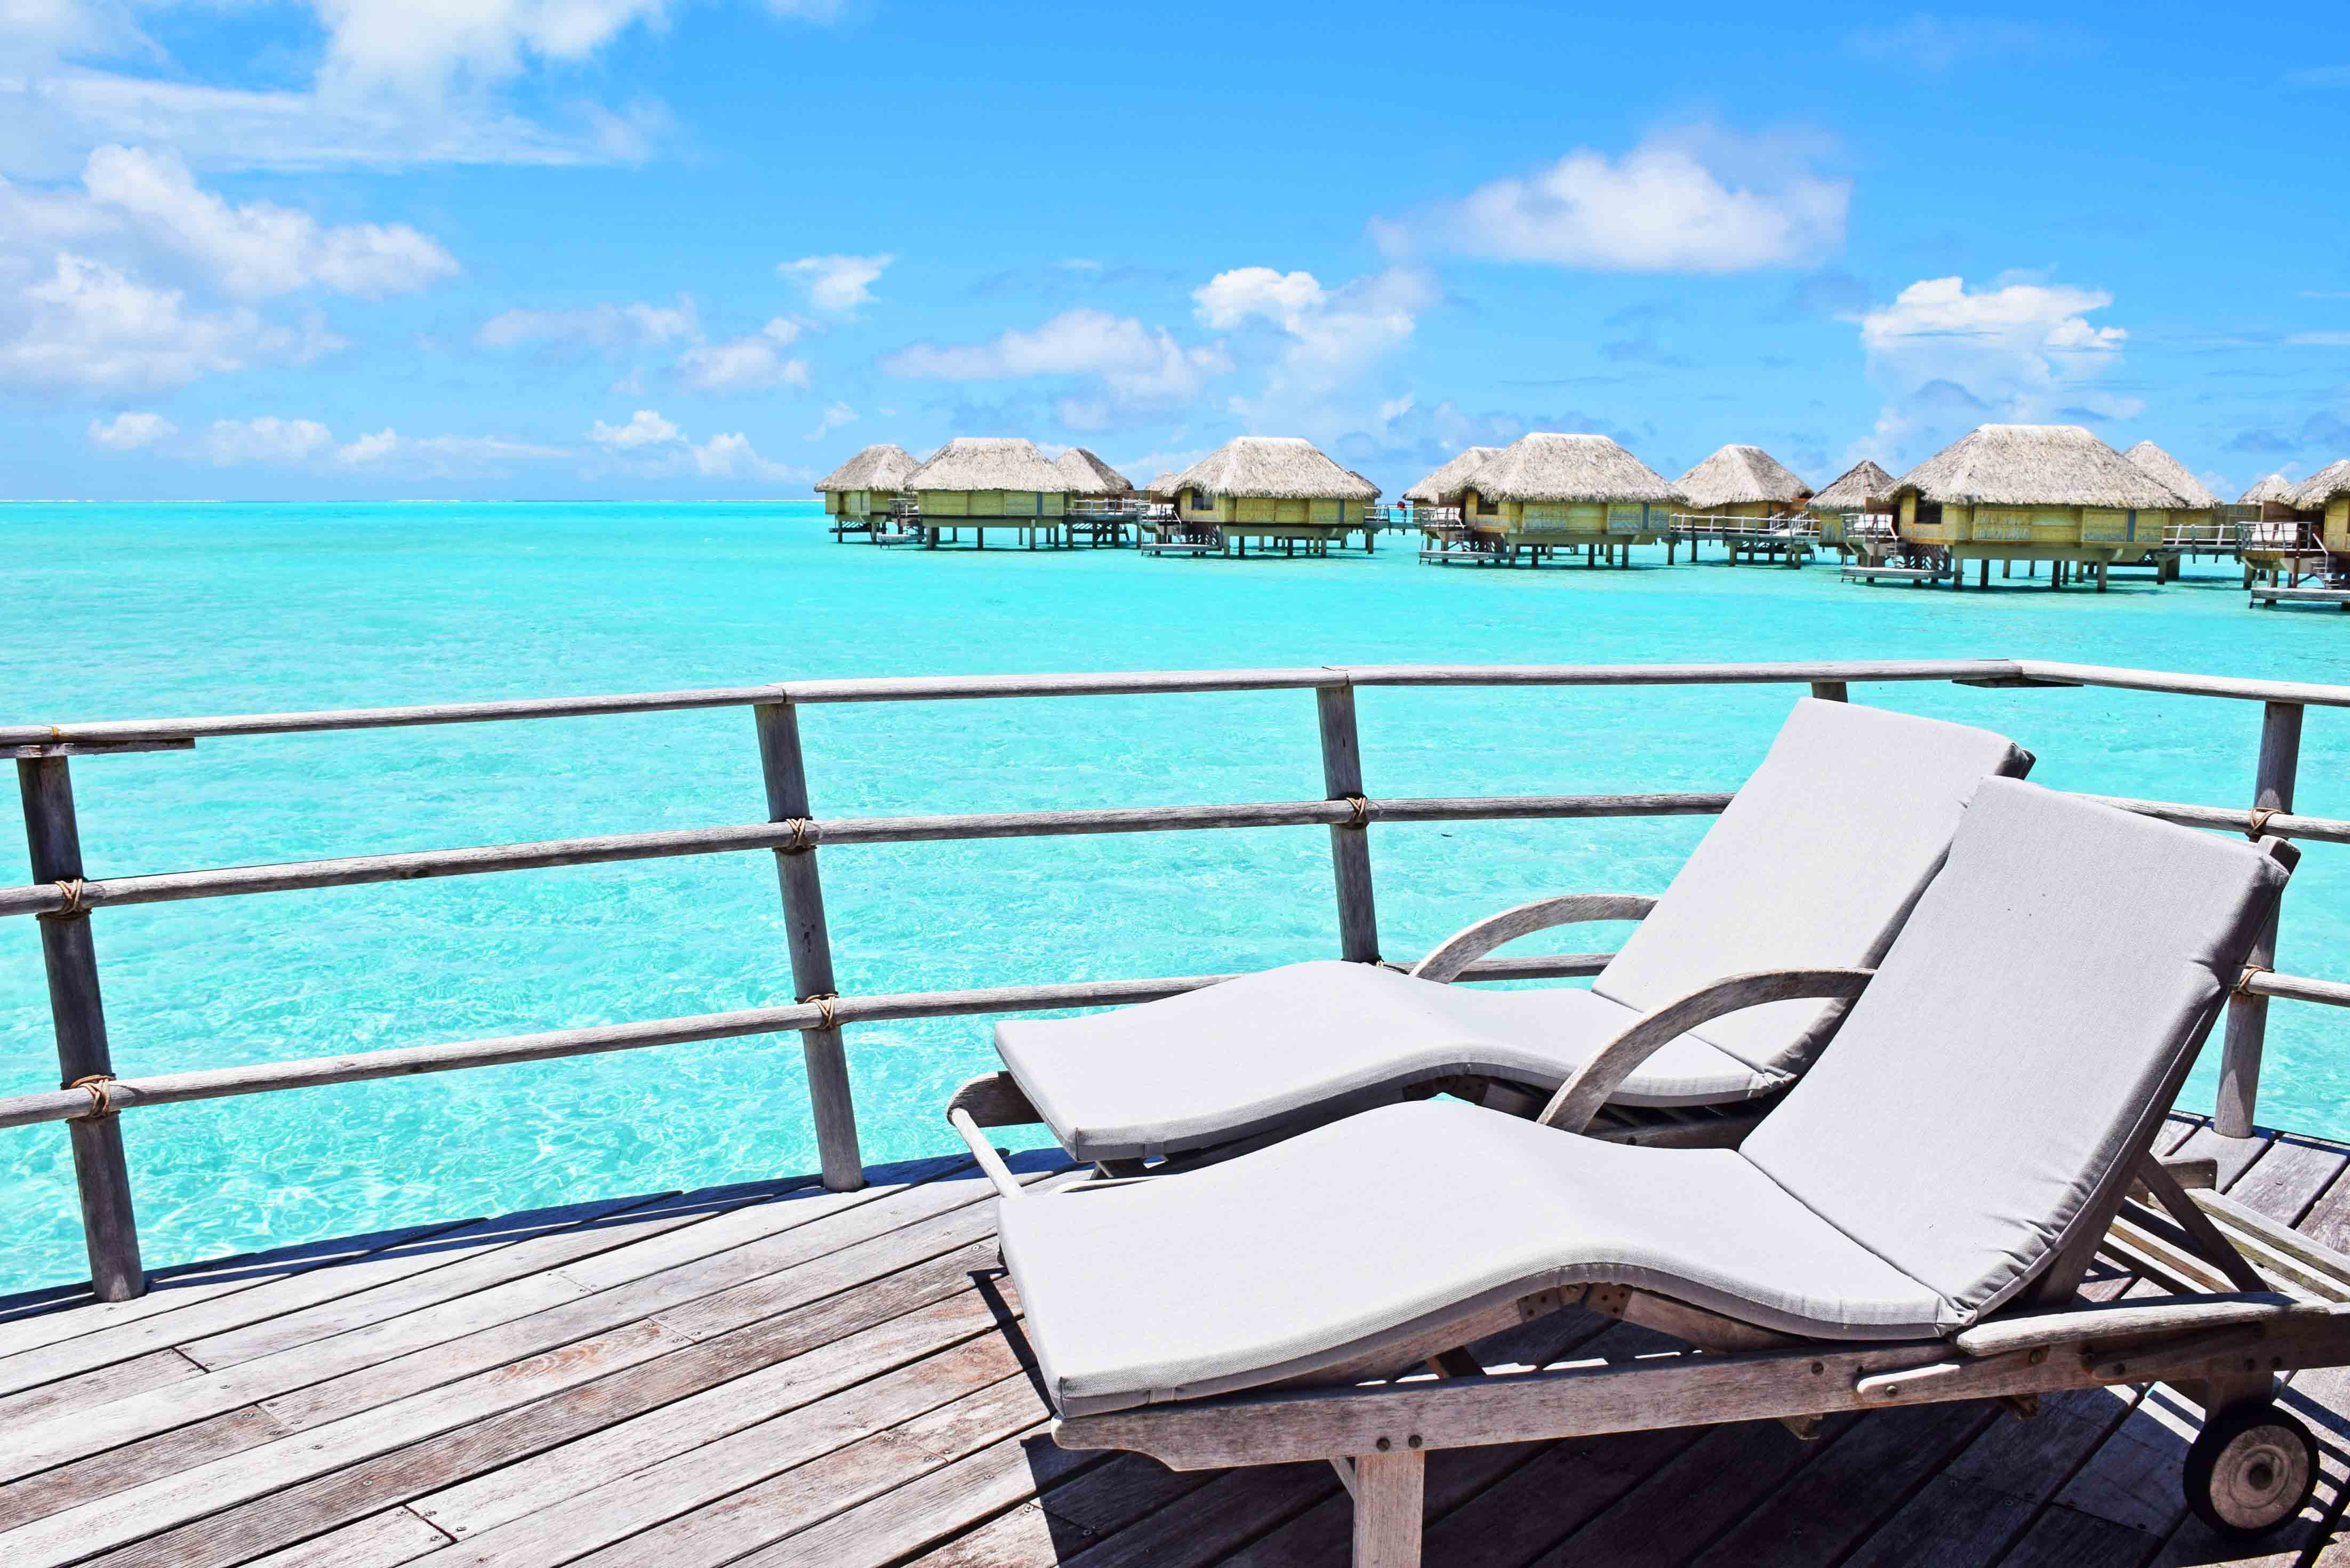 Terraço do bangalô no Le Taha'a Island Resort, na Polinésia Francesa | foto: Lala Rebelo